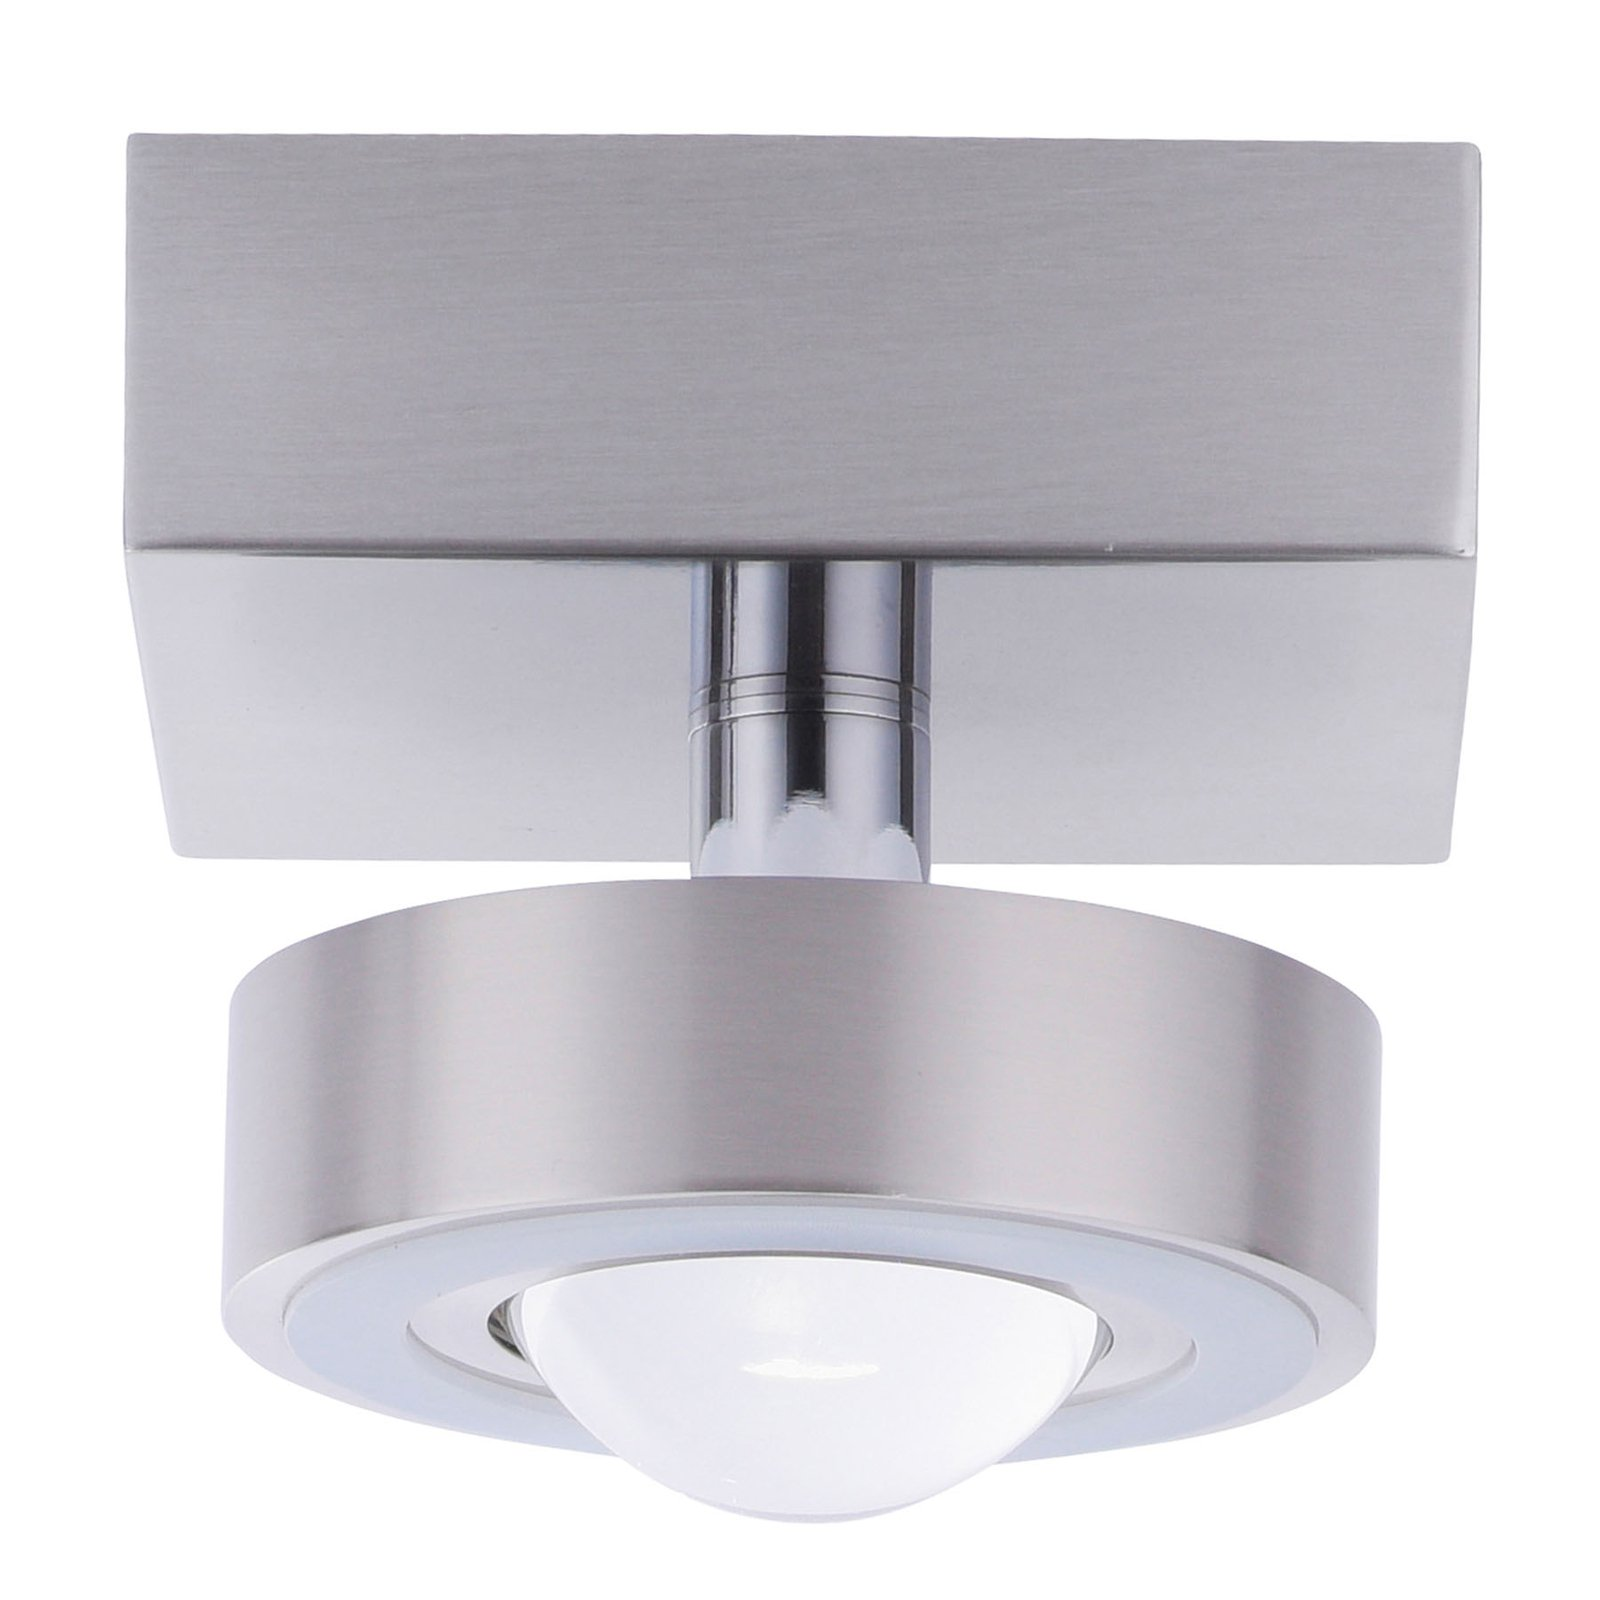 Paul Neuhaus Q-MIA LED-taklampe stål